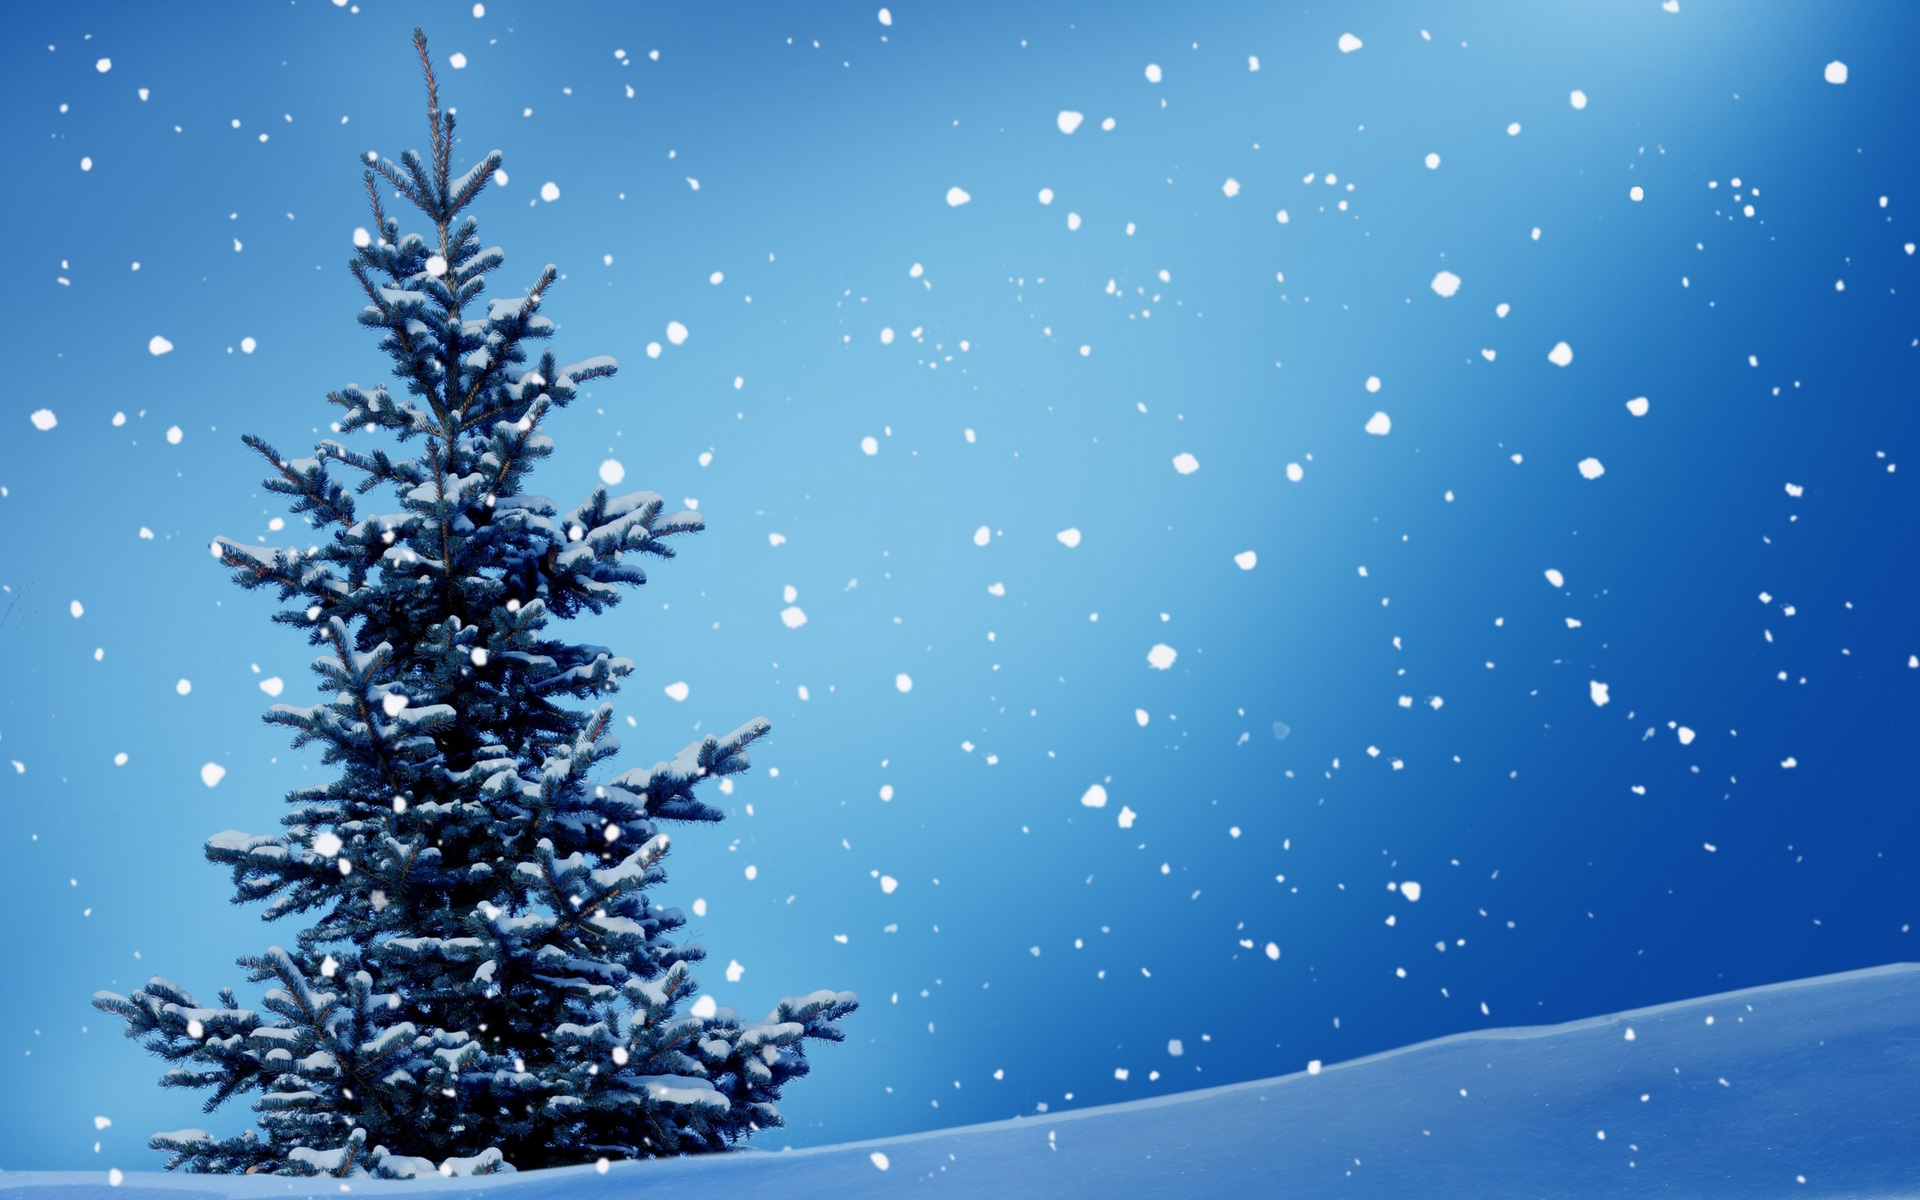 Зимняя елка обои на рабочий стол